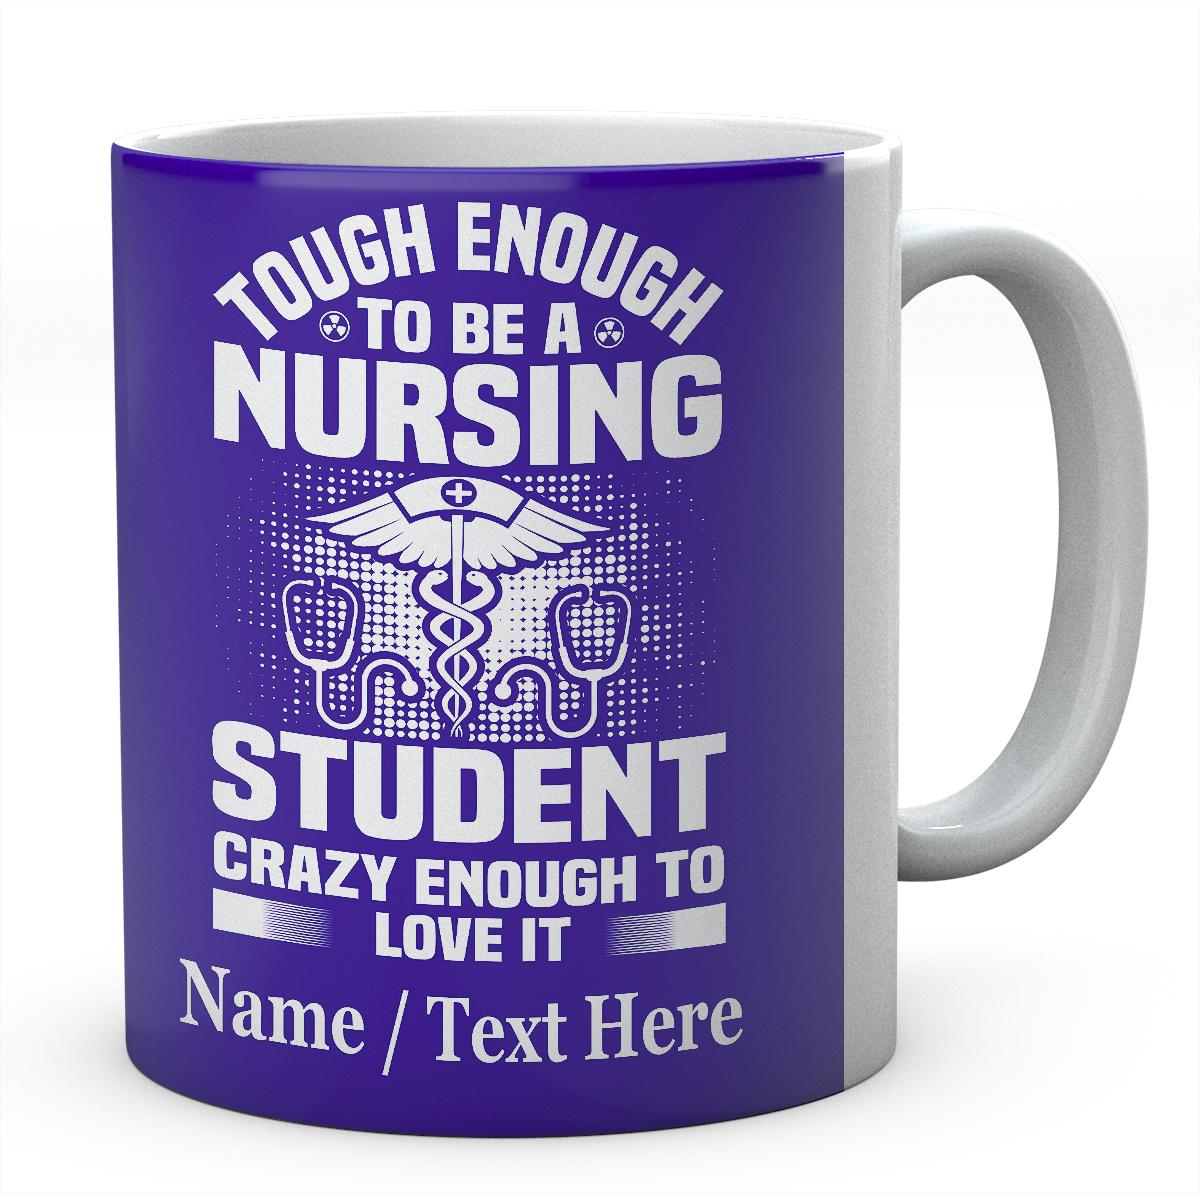 Tough Enough to Be A Nursing Student..Personalised Printed Mug